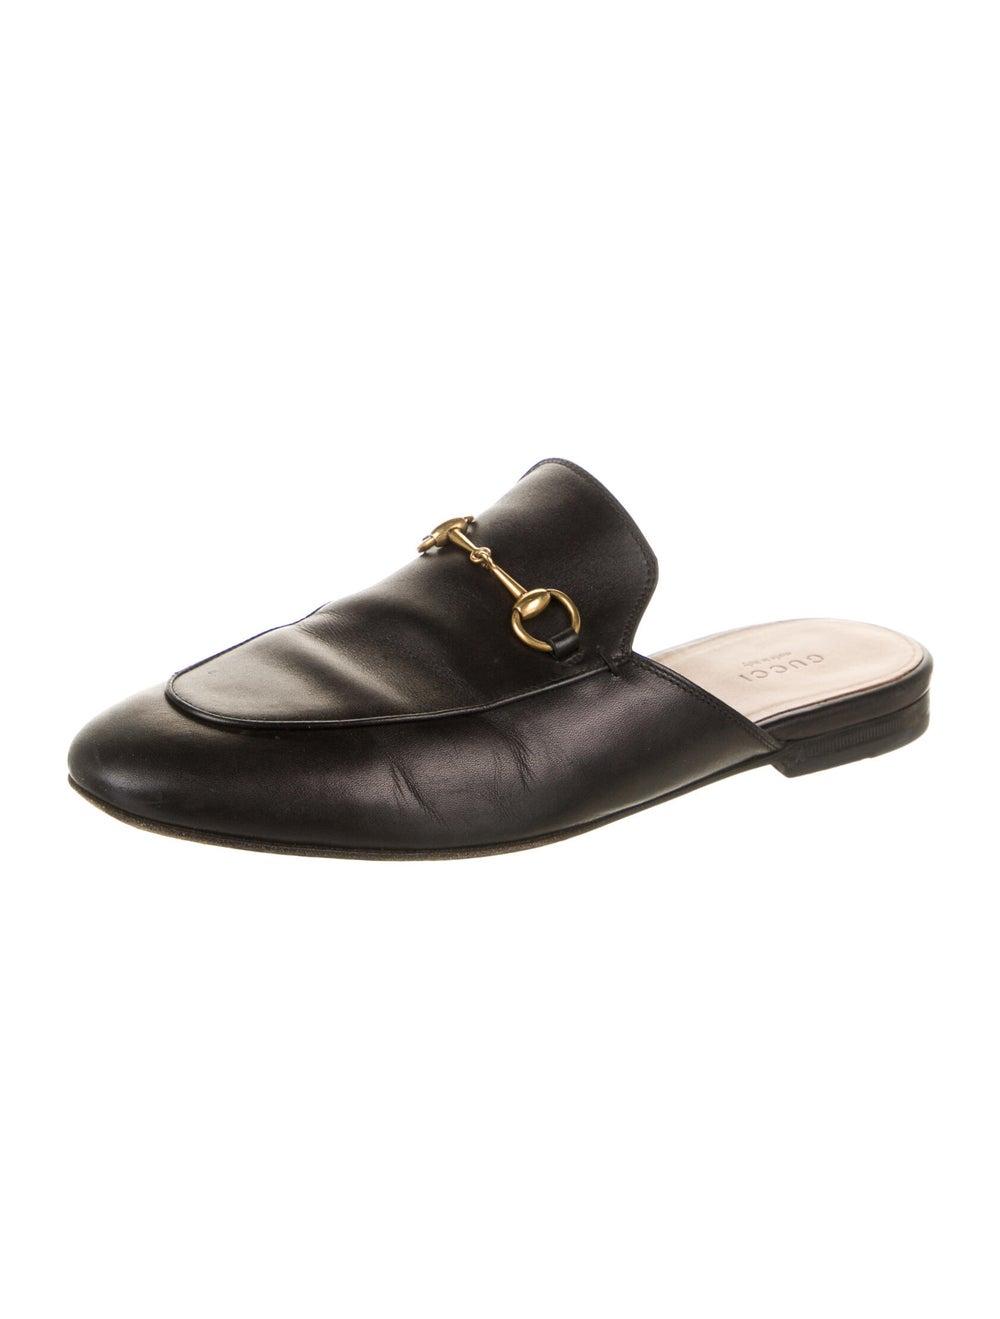 Gucci Princetown Horsebit Accent Mules Black - image 2